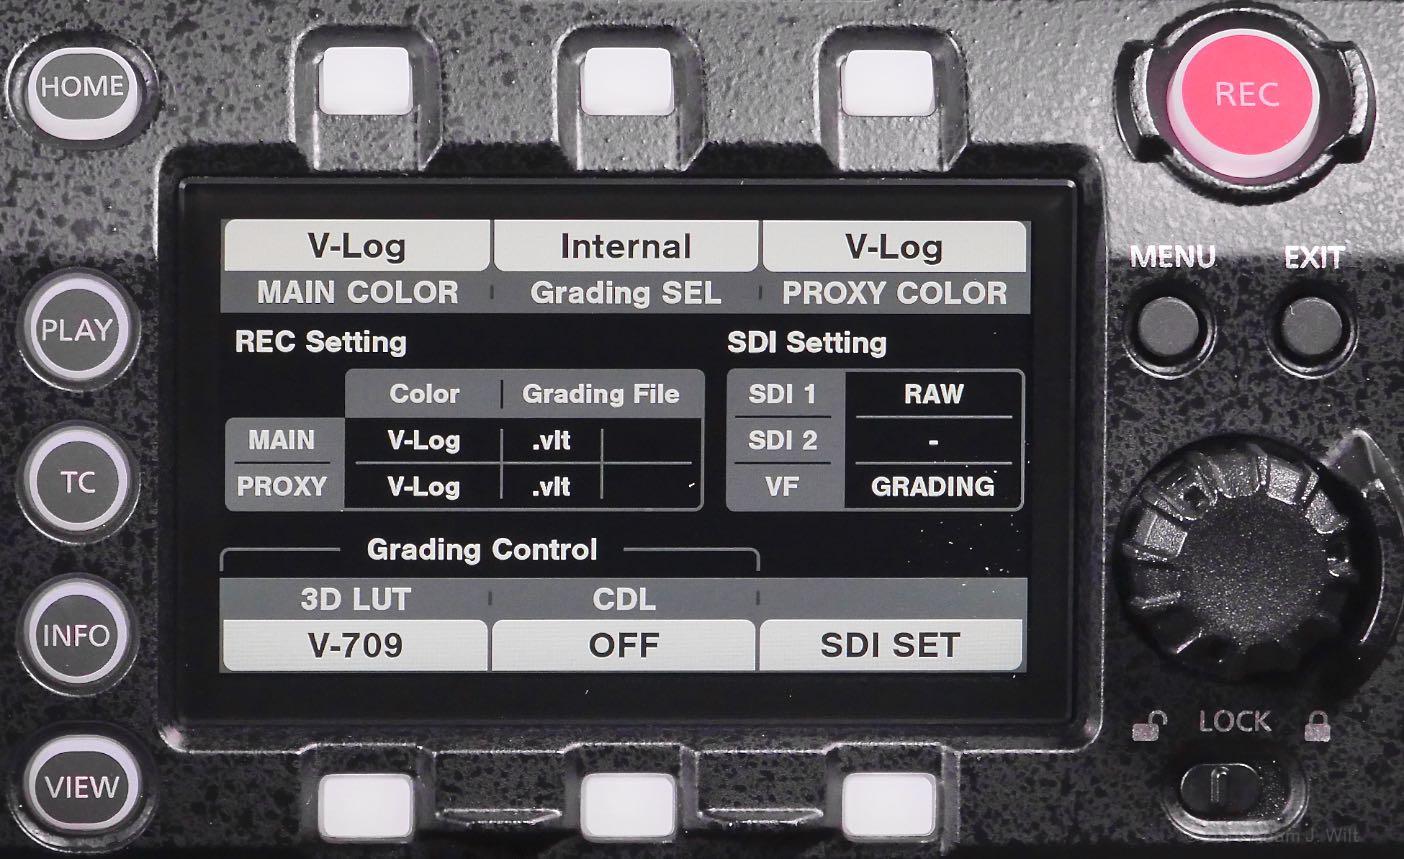 VariCam LT control panel, color page